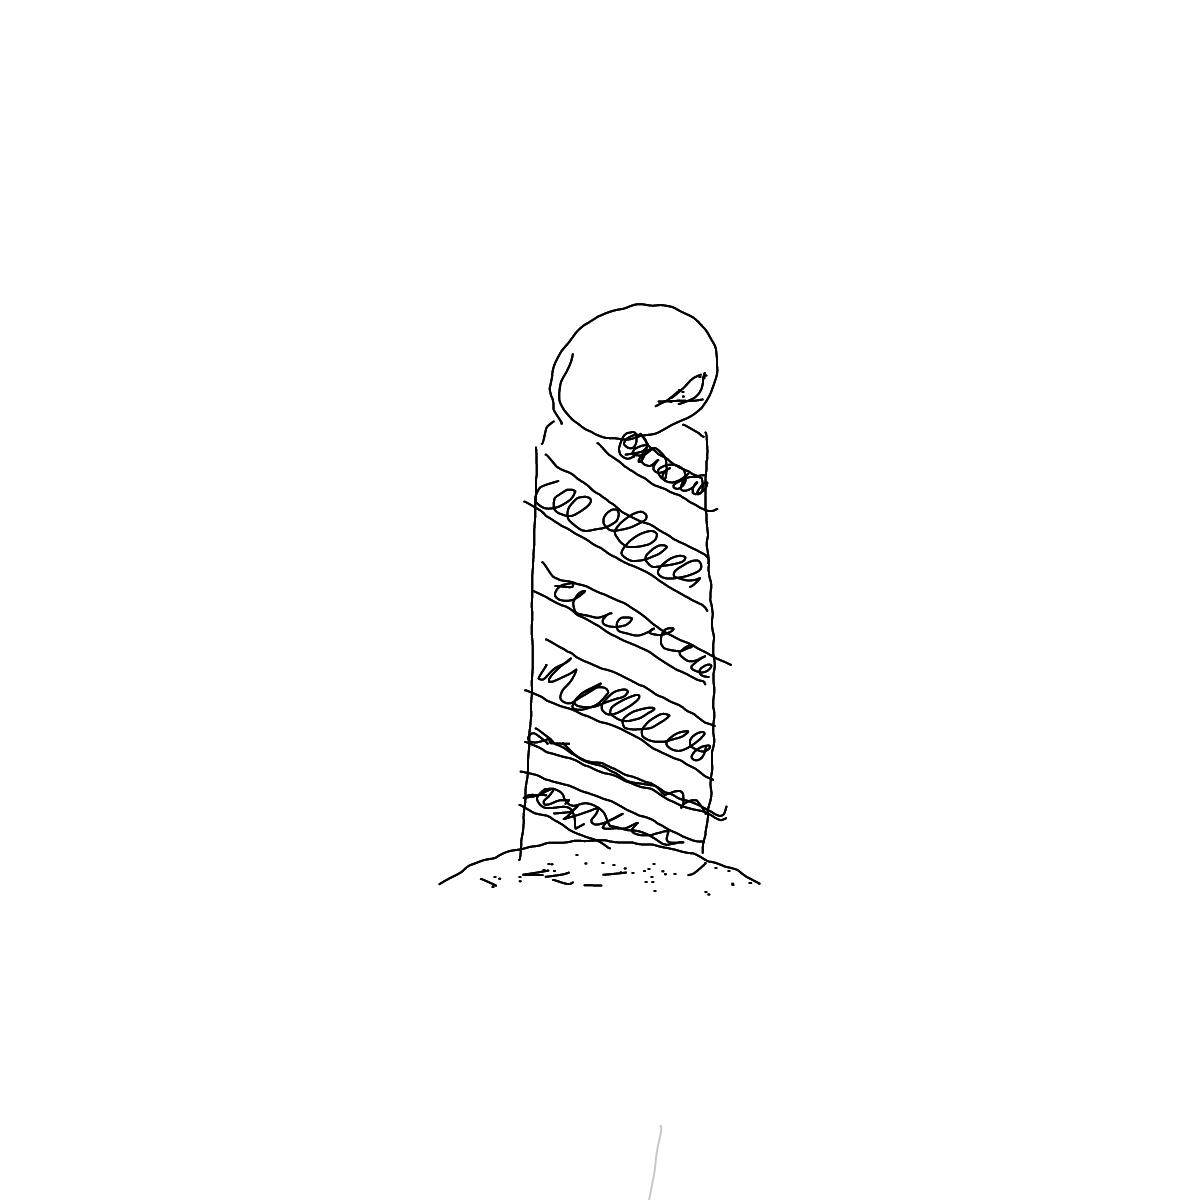 BAAAM drawing#23529 lat:83.0813598632812500lng: -70.0982513427734400